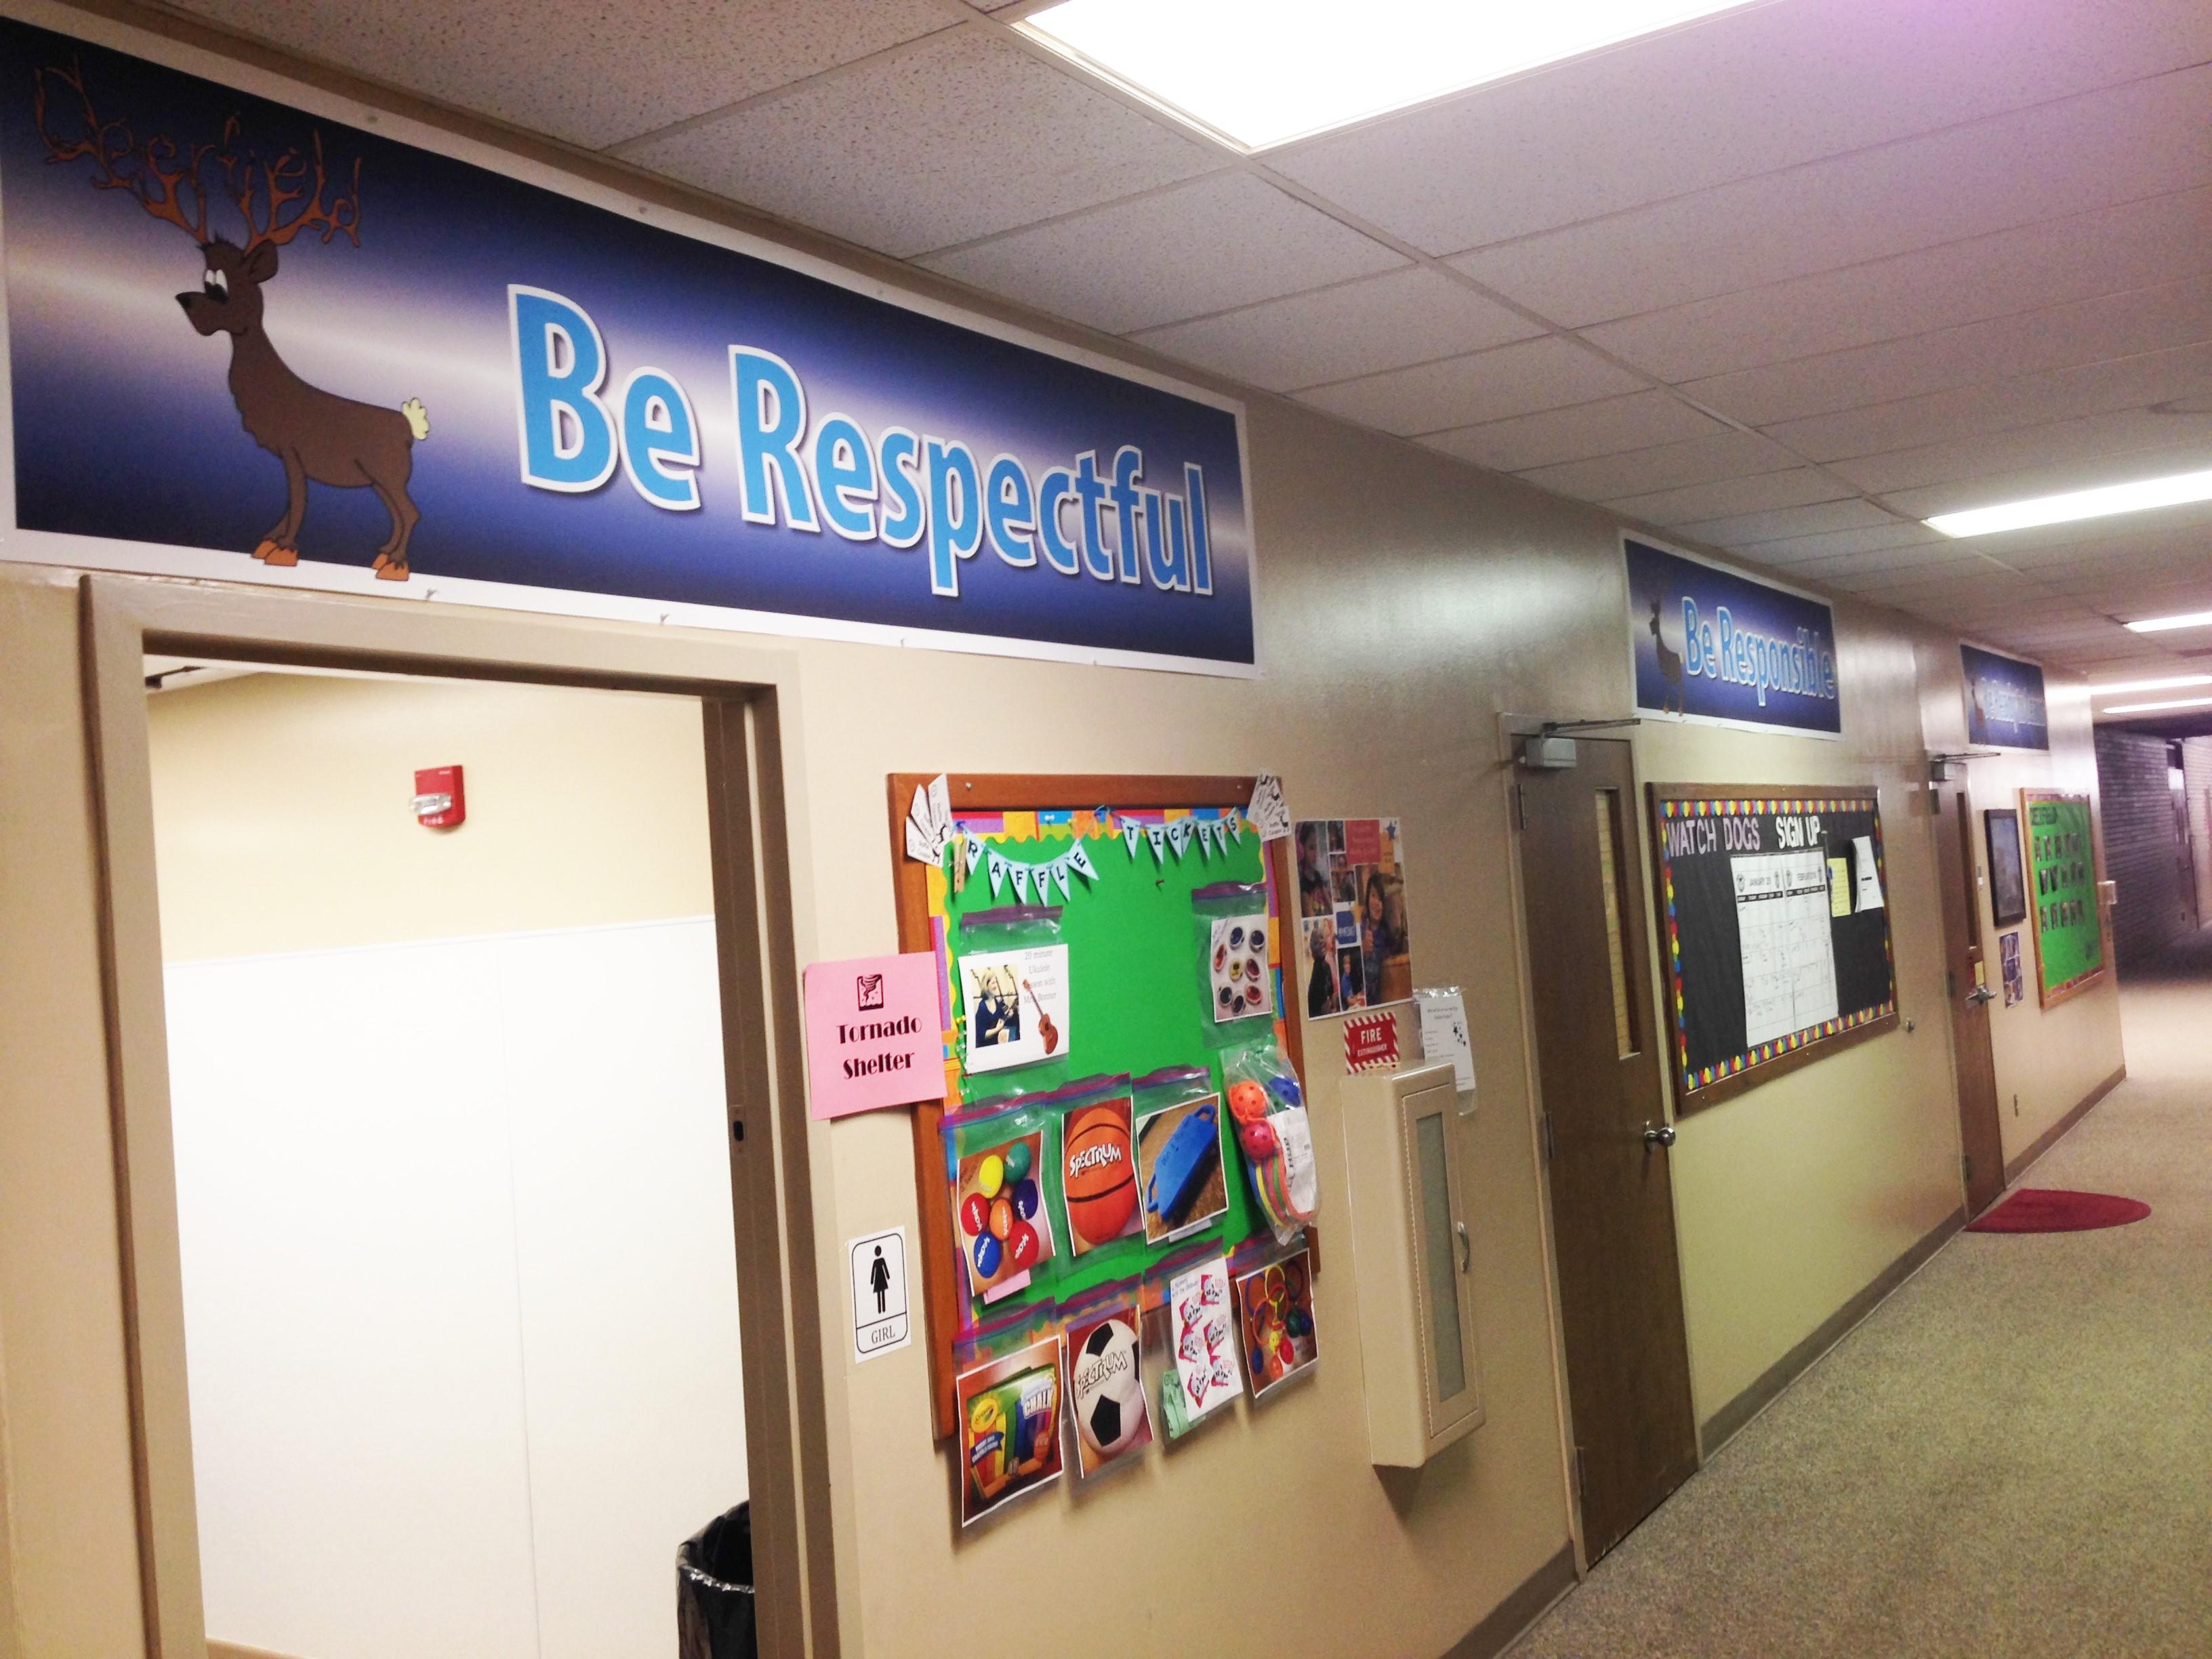 Be Respectull hallway banner above raffle ticket reward board